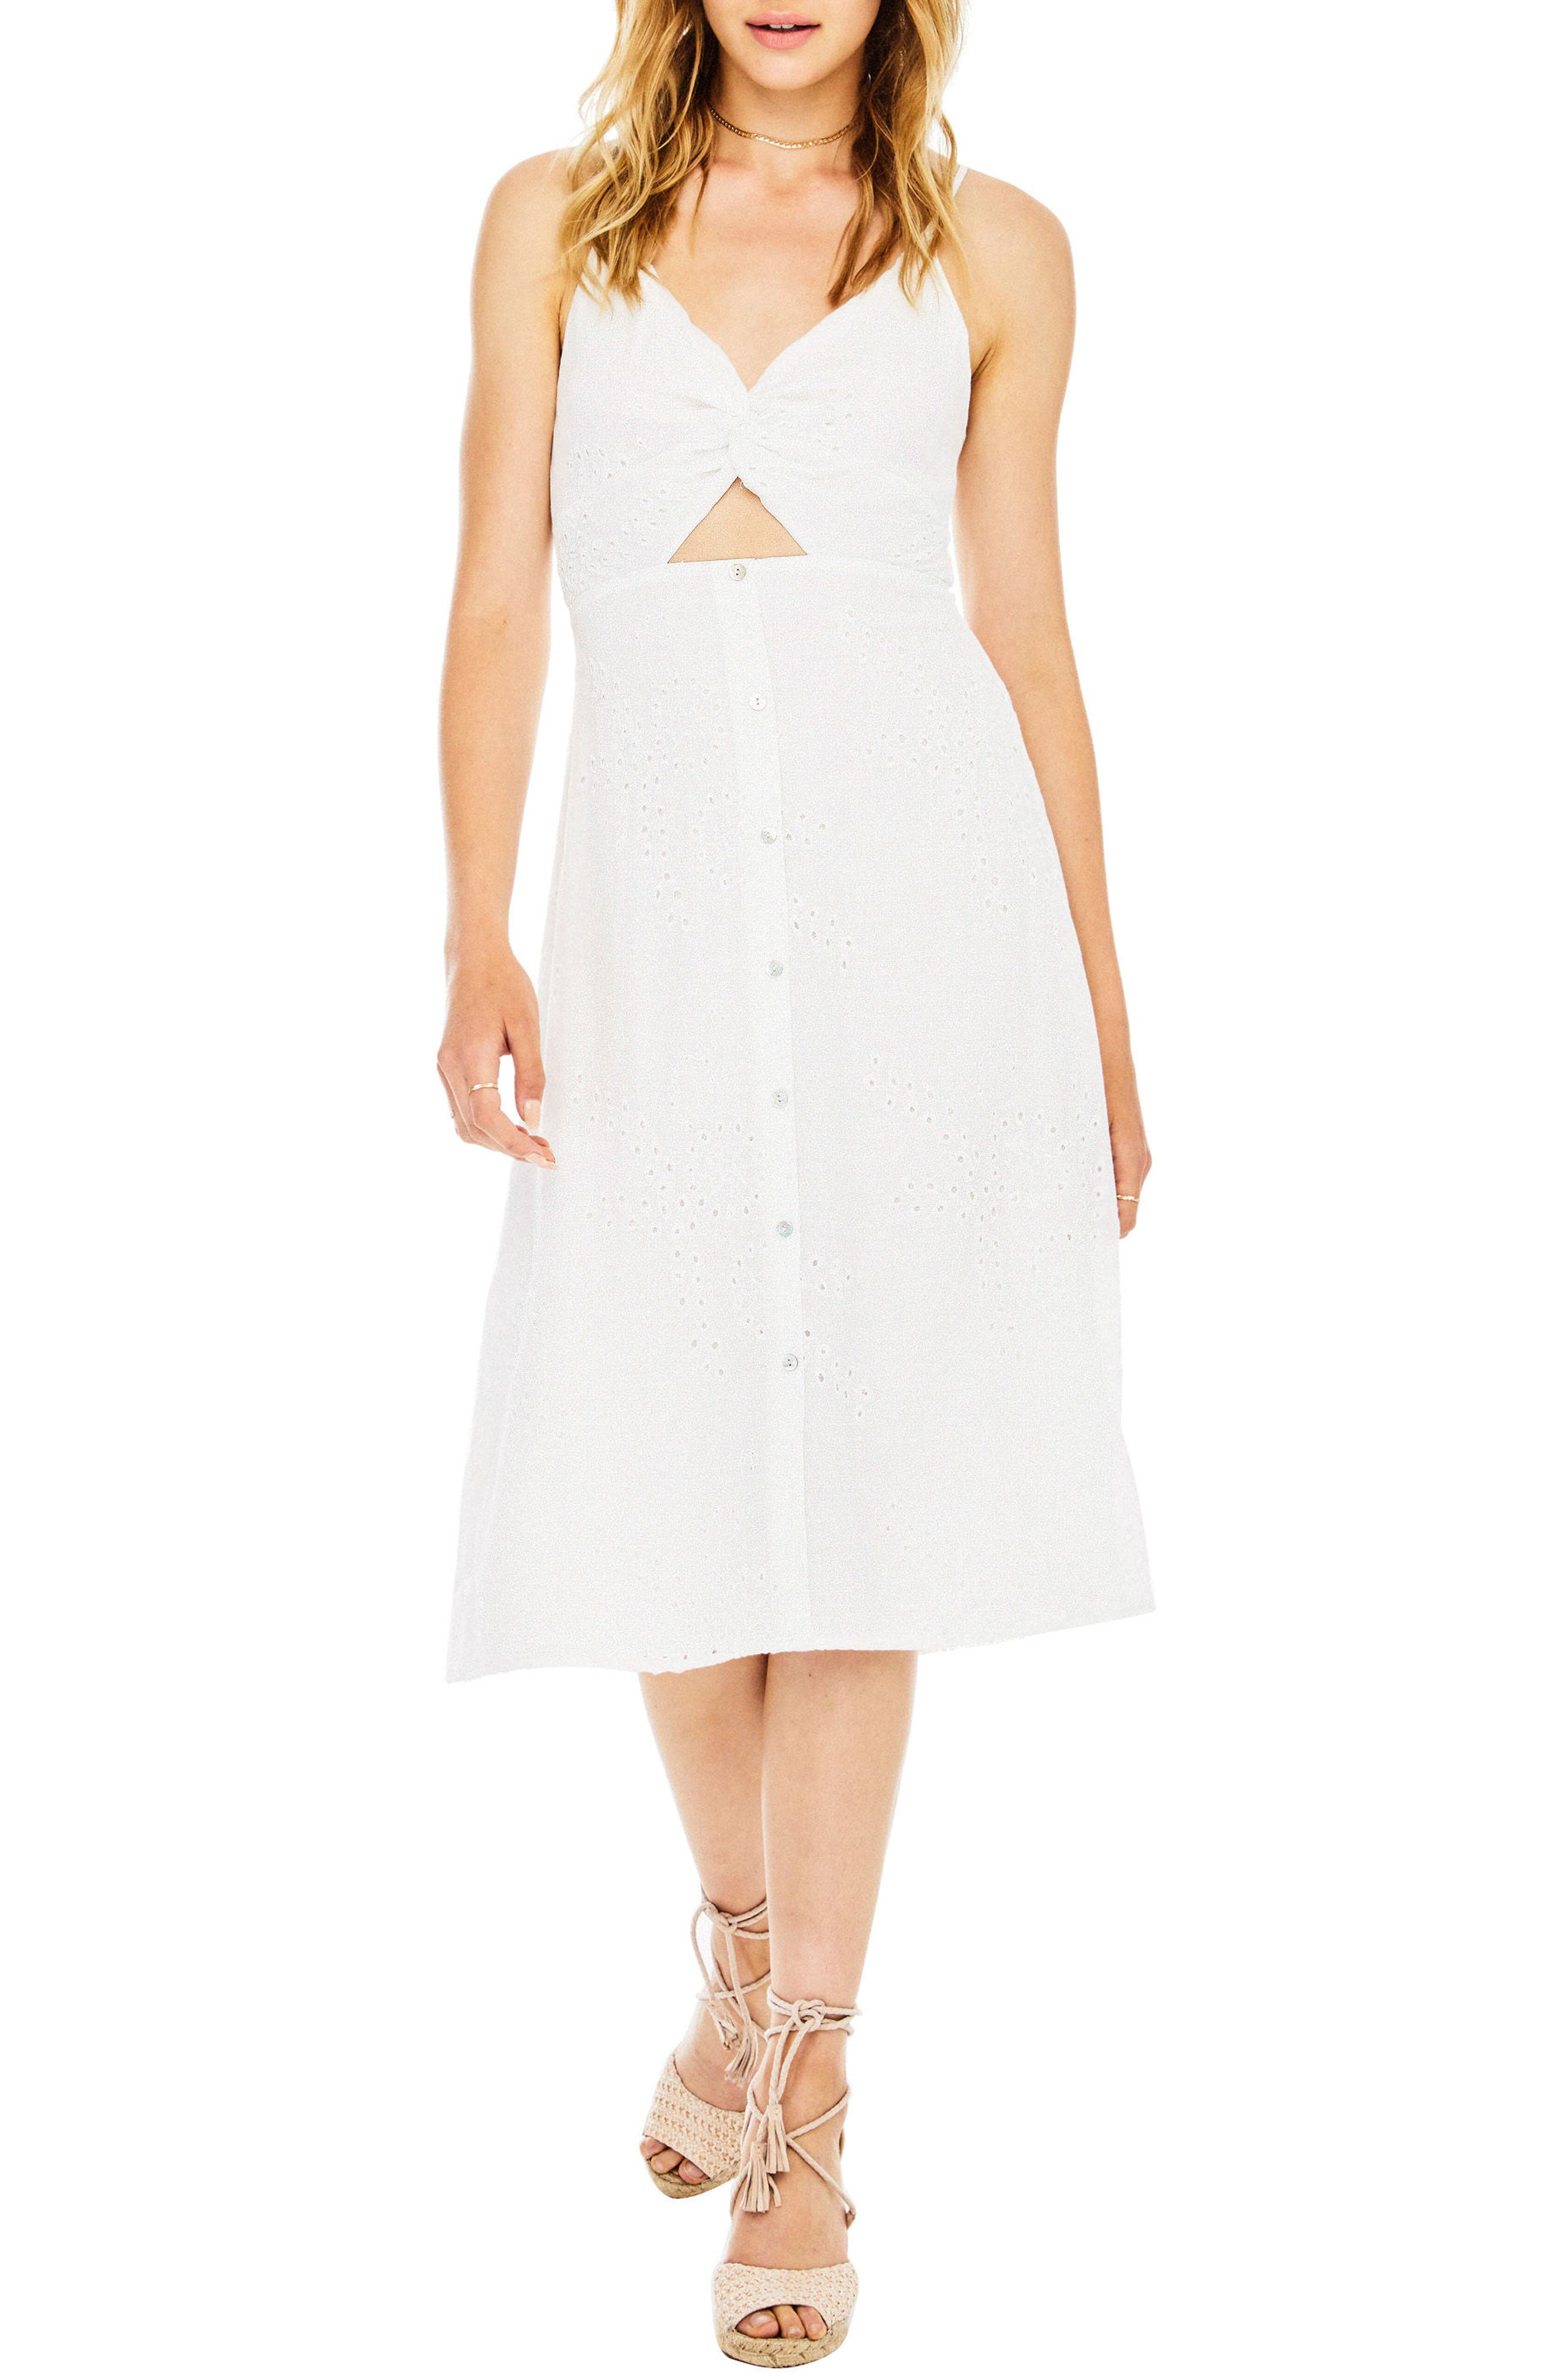 Main Image - ASTR the Label Ellowyn Dress